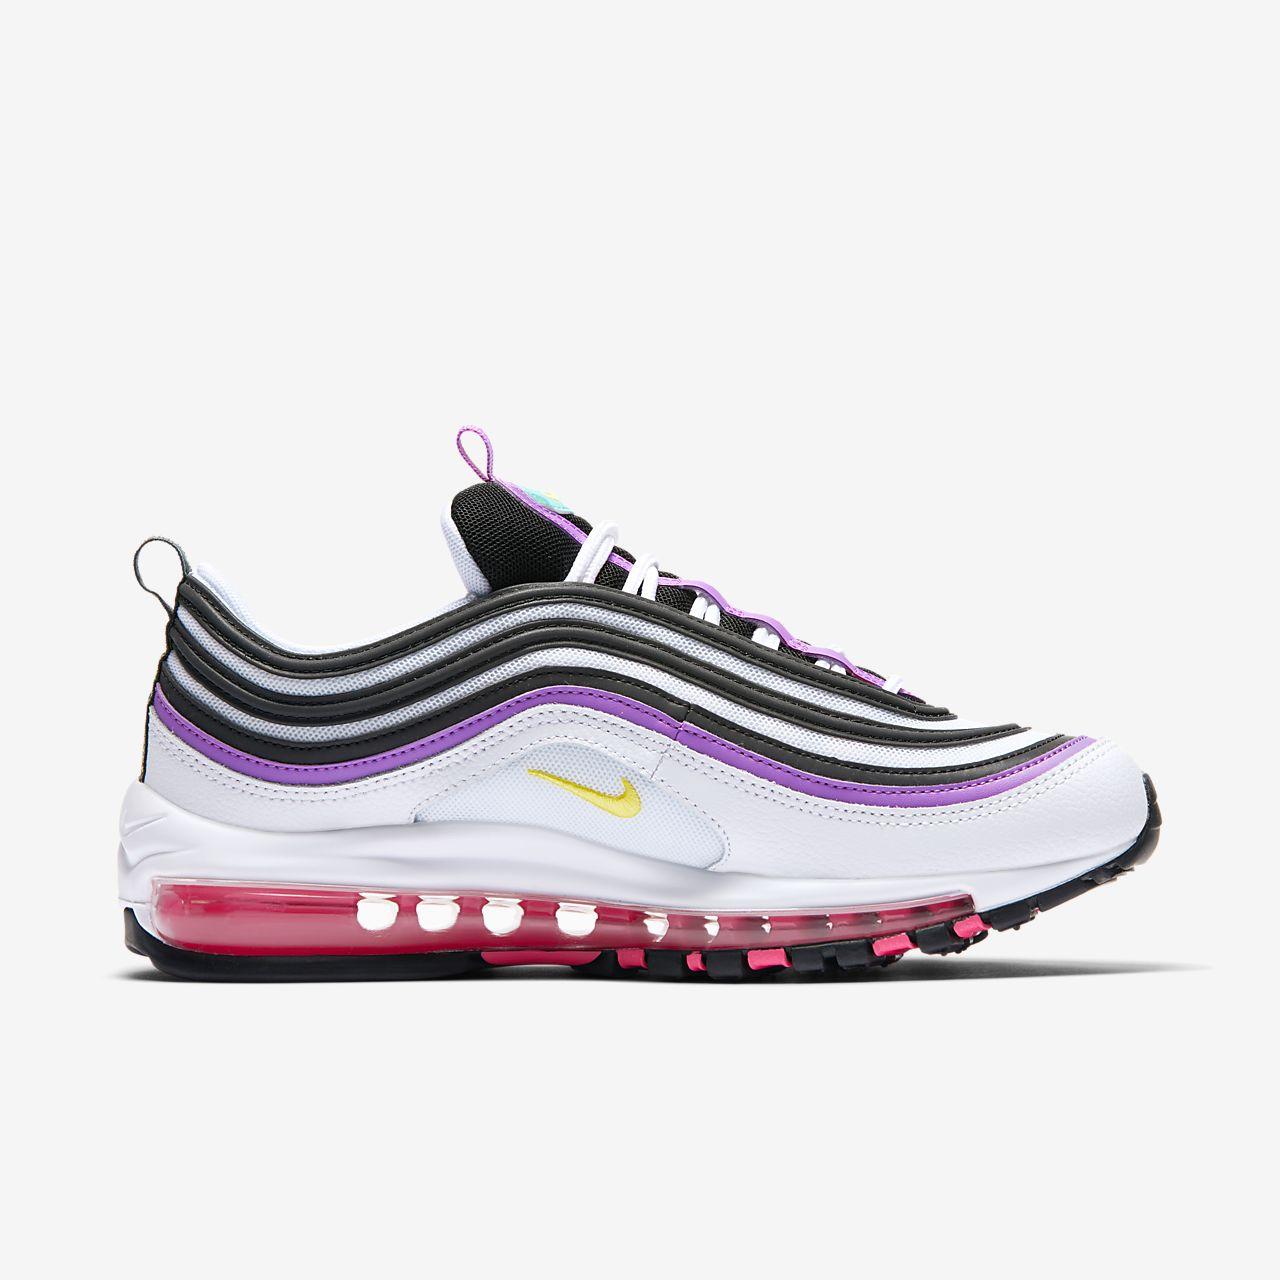 official photos 1ccdd 2f2ab ... Nike Air Max 97 Women s Shoe